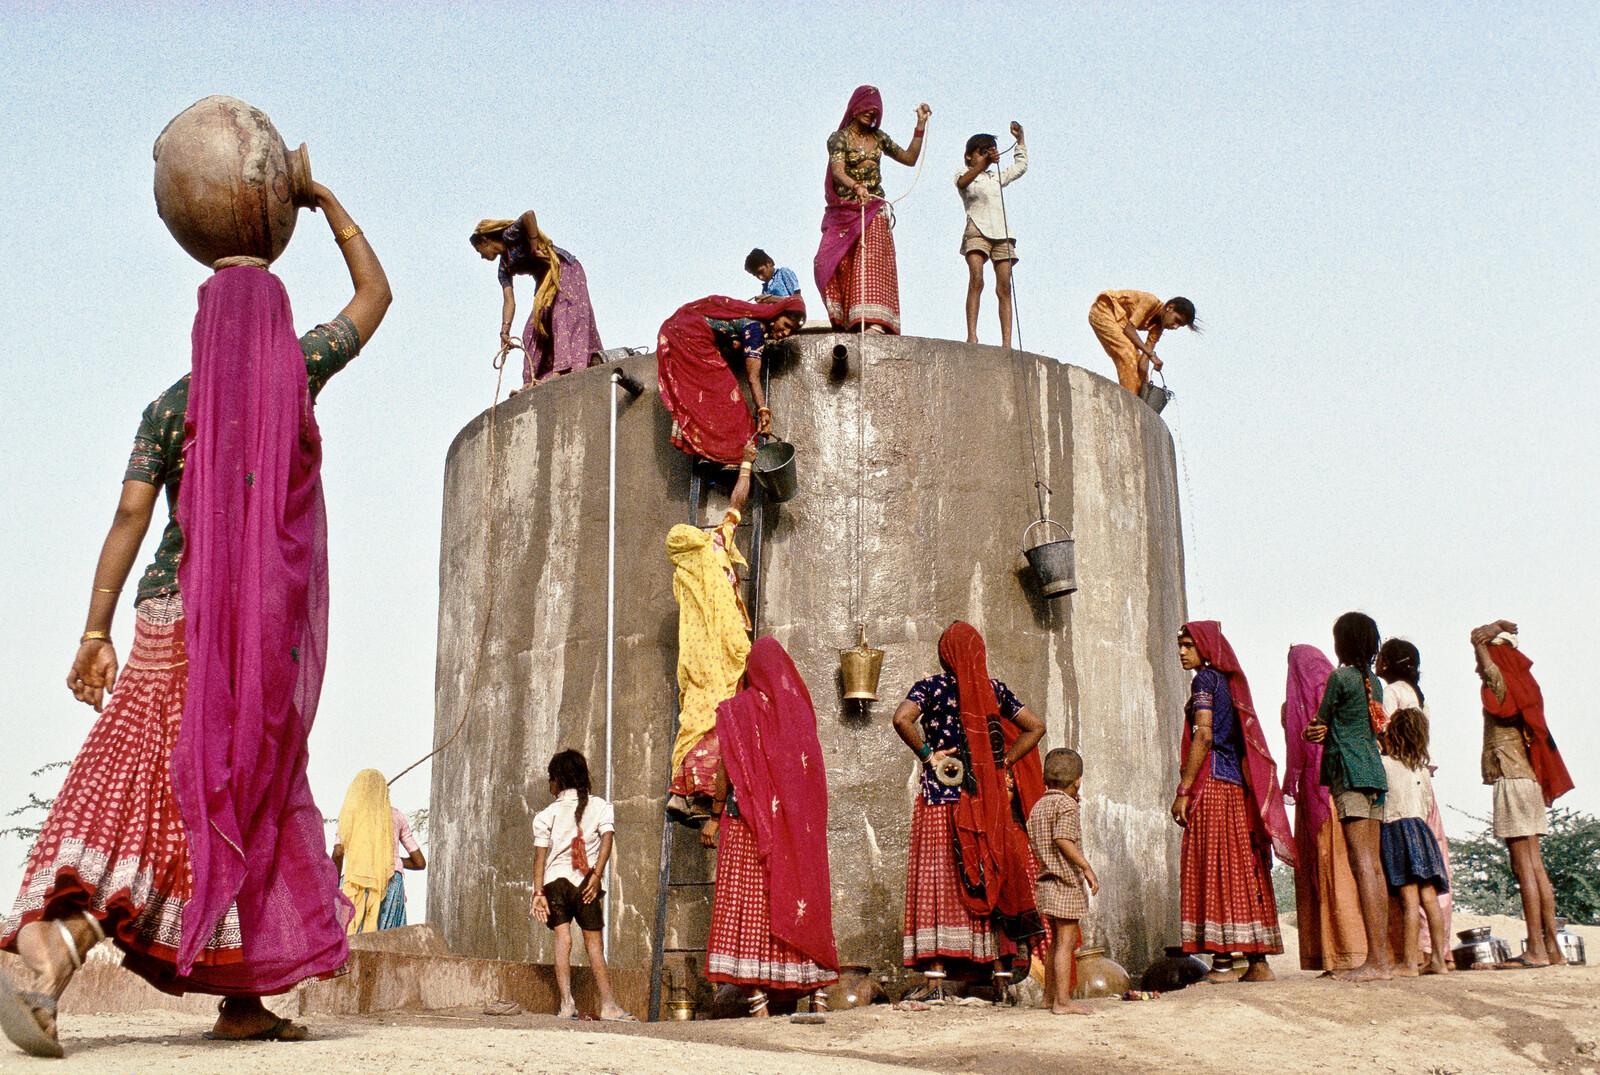 collecting water, Rajasthan - Christopher Pillitz